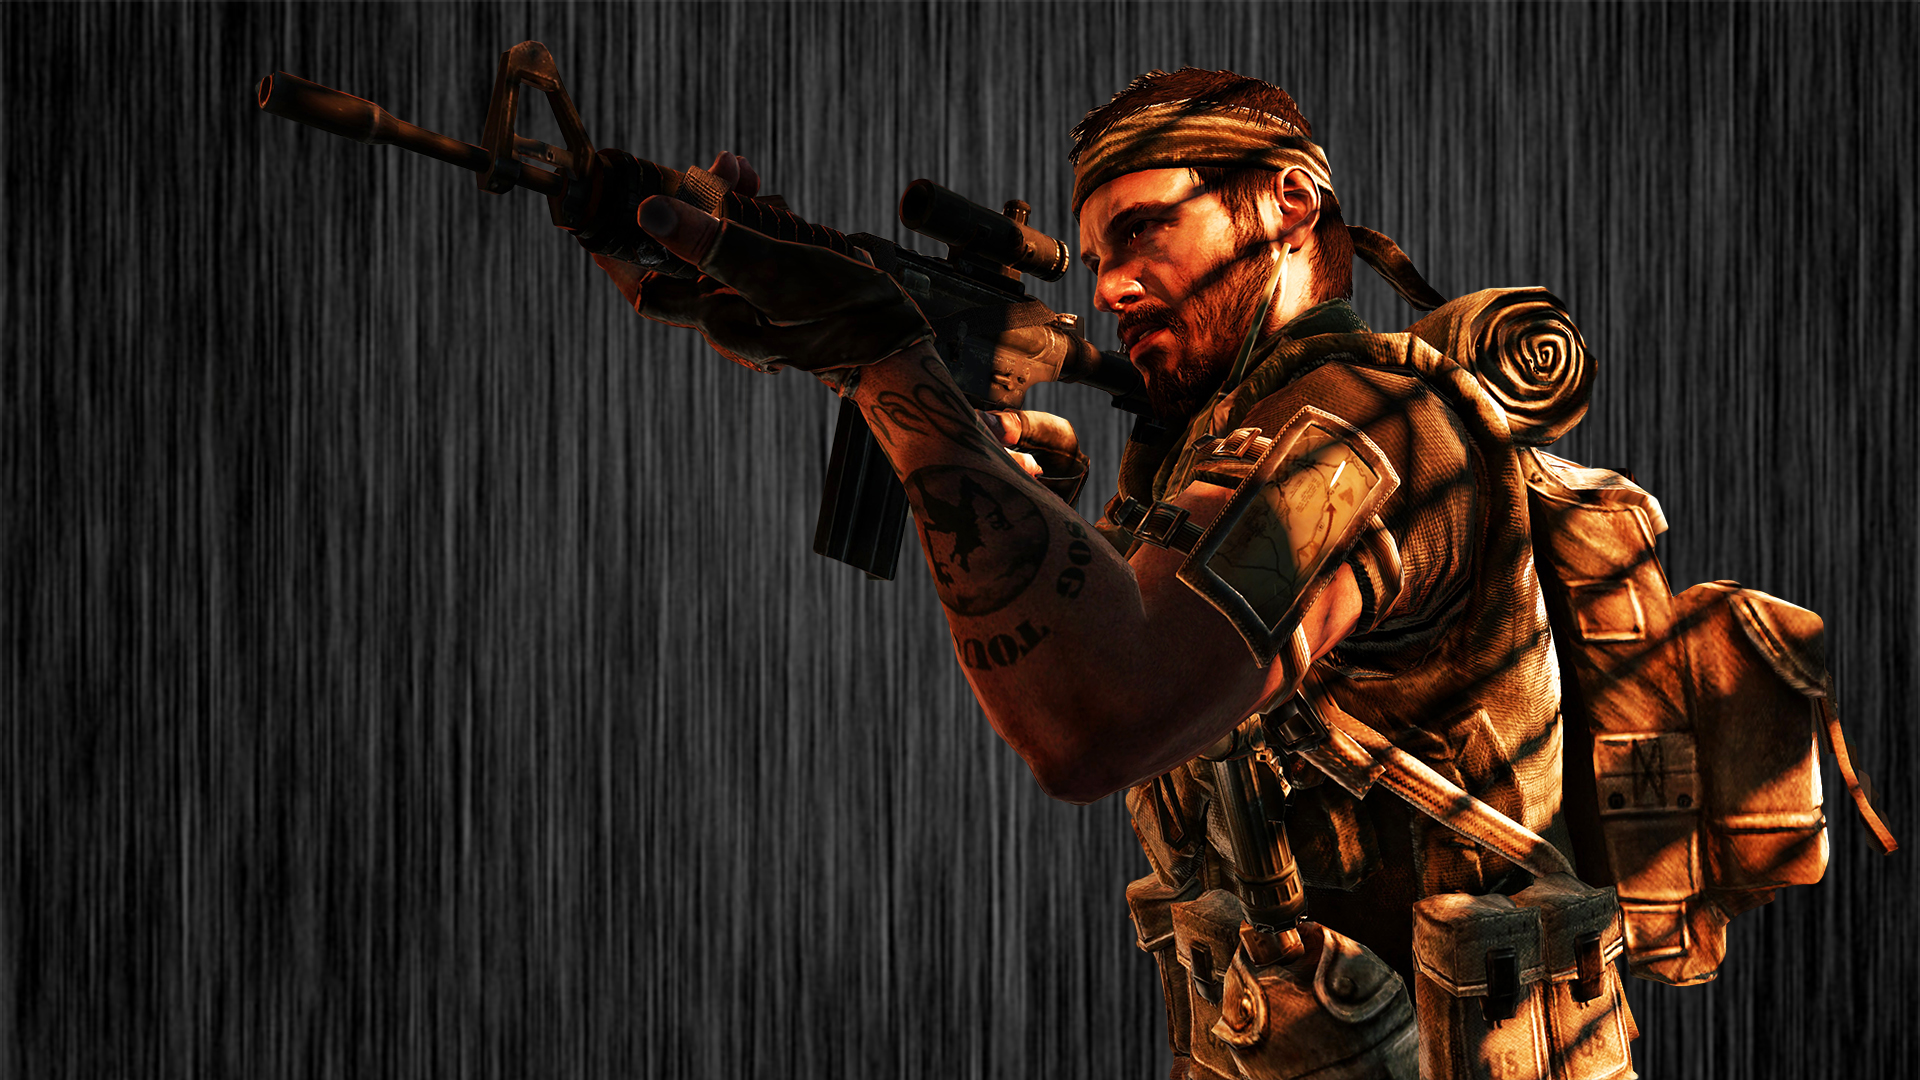 Fonds d'écran Jeux Vidéo Call of Duty Modern Warfare 3 MW3 soldat Wallpapers